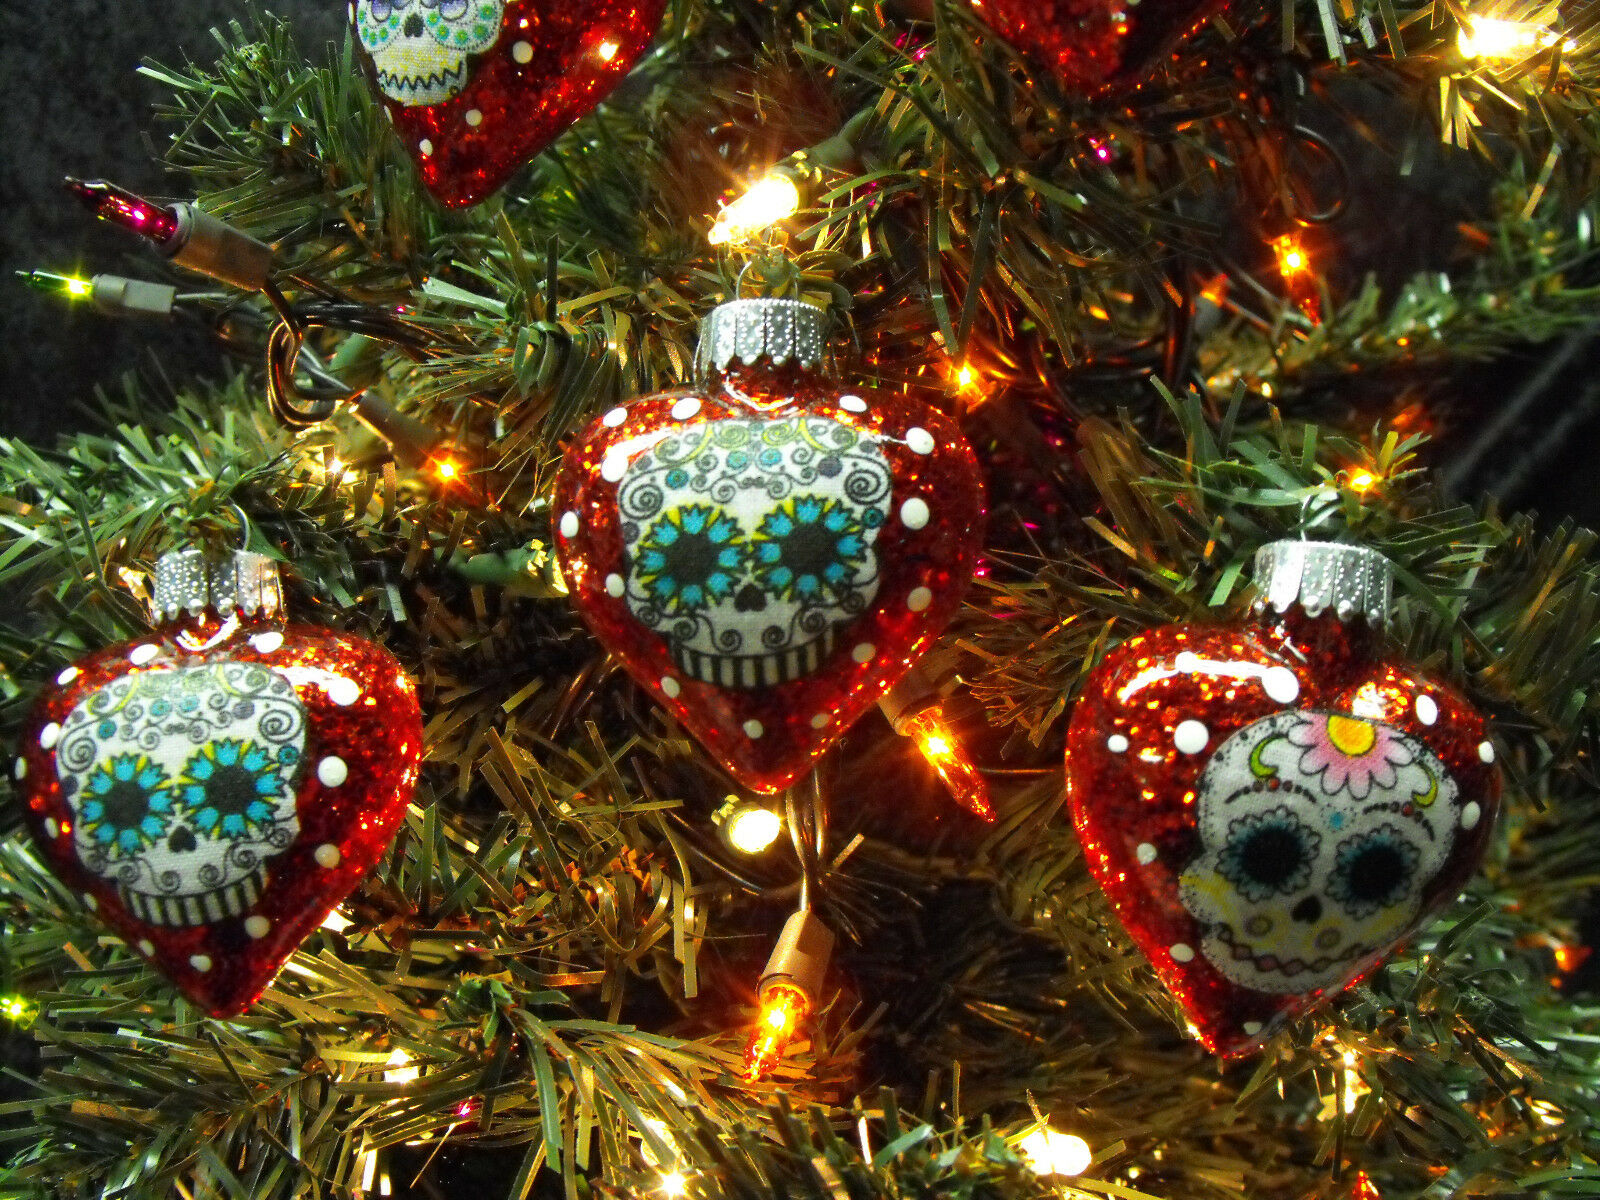 Glass heart christmas ornaments - Sugar Skulls Decorated Glass Heart Christmas Ornaments Set Of 6